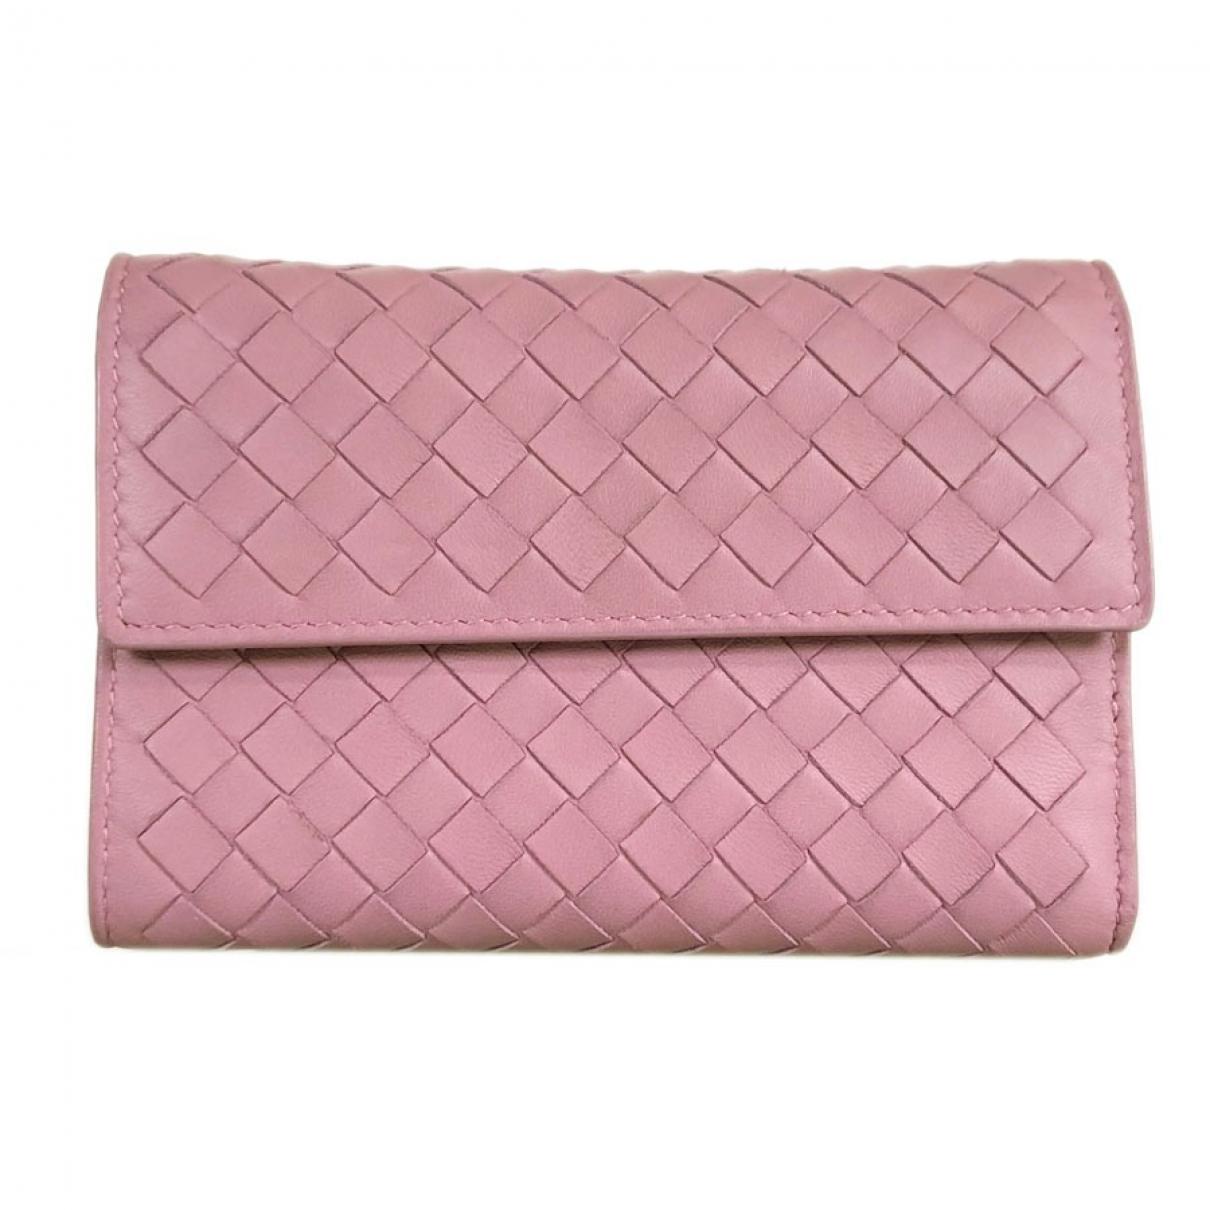 Bottega Veneta \N Pink Leather wallet for Women \N